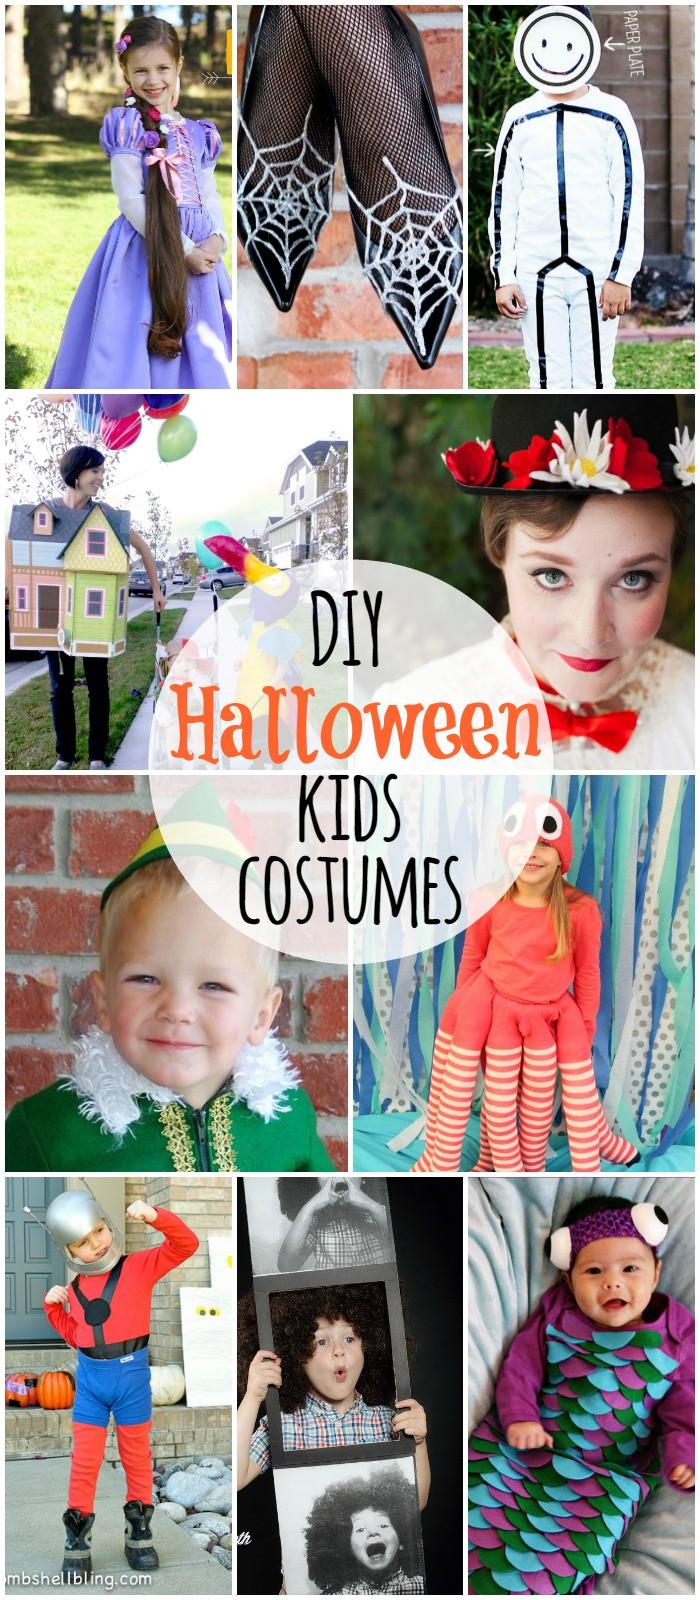 Best ideas about DIY Kids Halloween Costumes . Save or Pin DIY Halloween Kids Costumes Now.